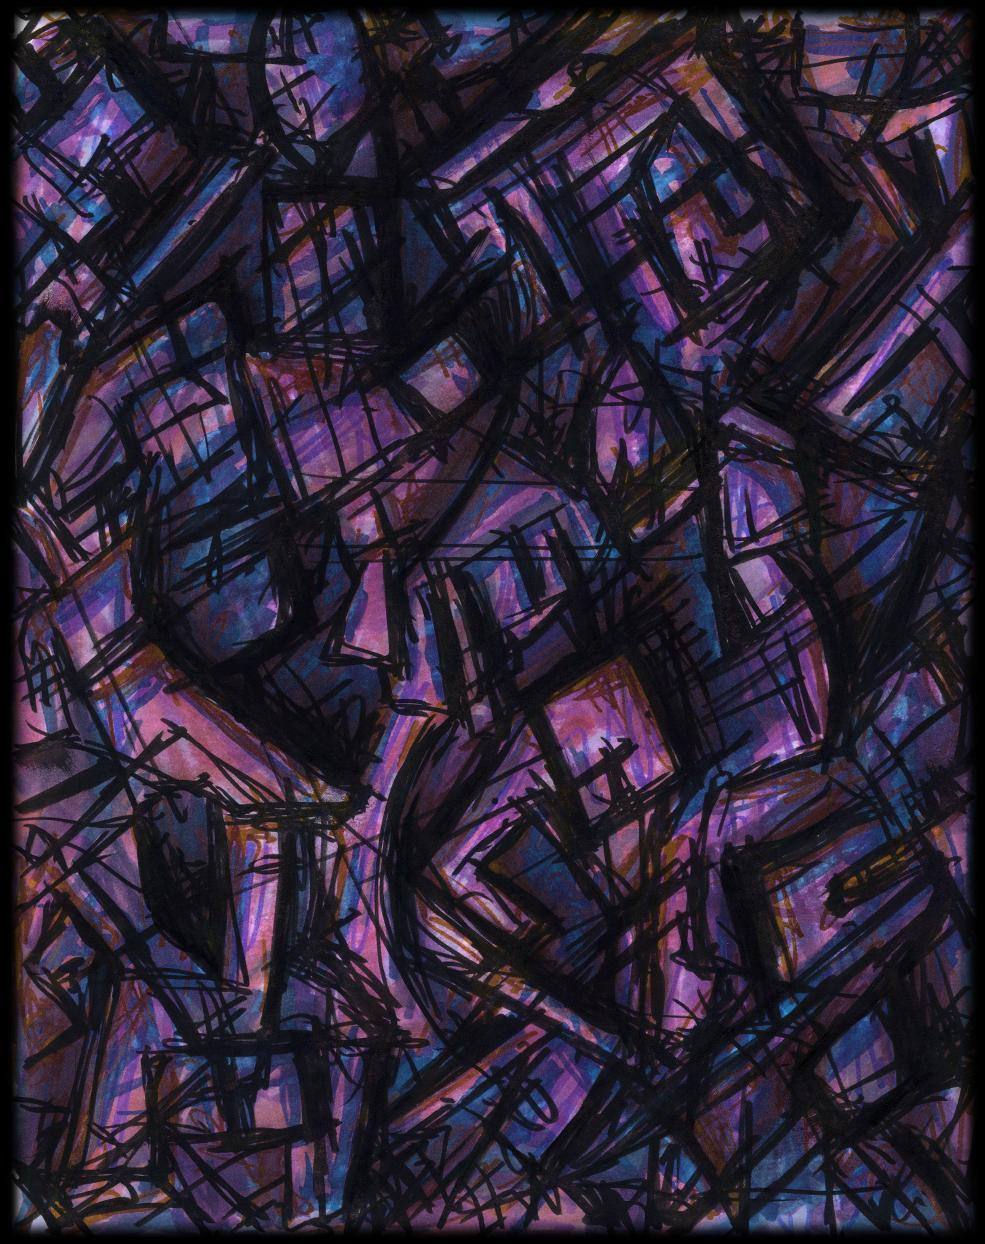 Conpagis (Digitally recolored)